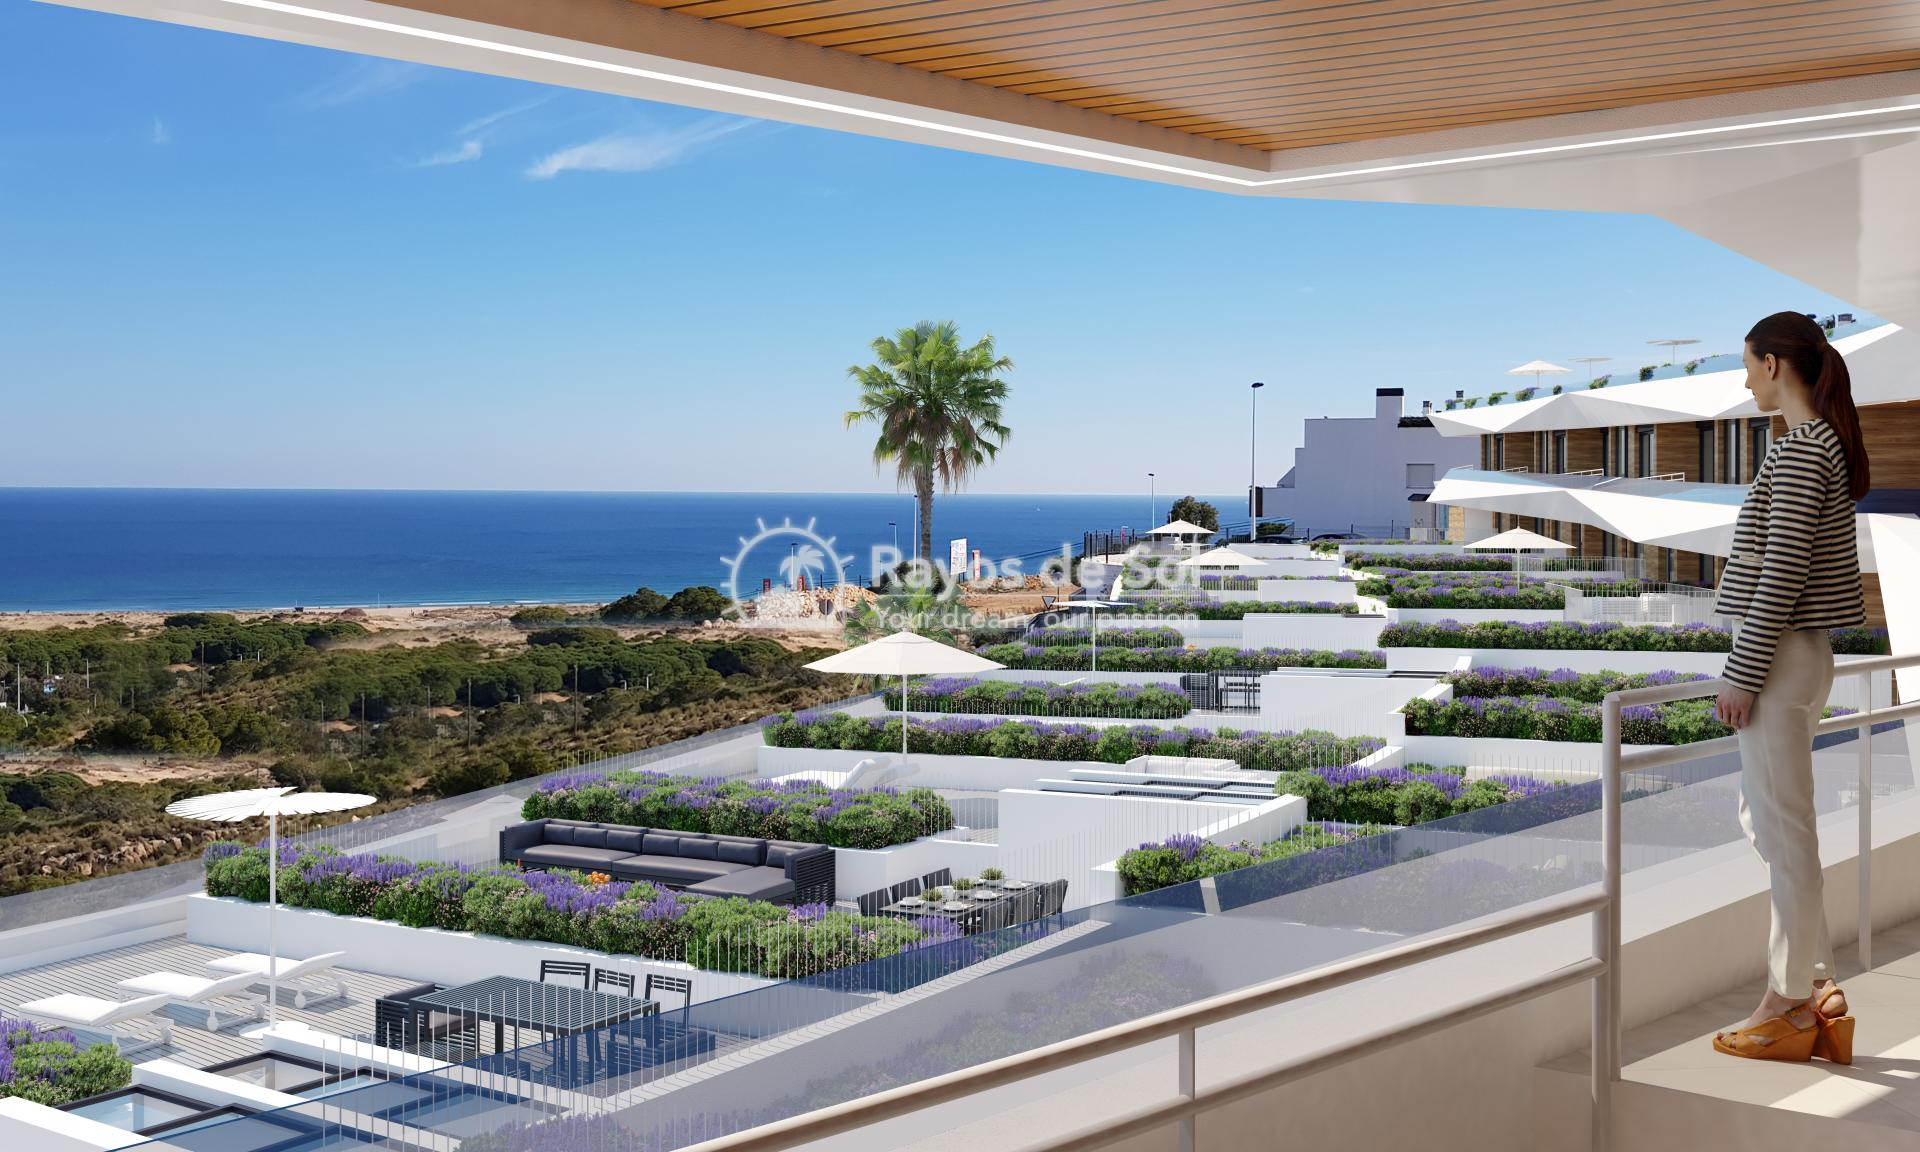 Apartment with seaviews  in Santa Pola, Costa Blanca (Aura apt2d) - 6